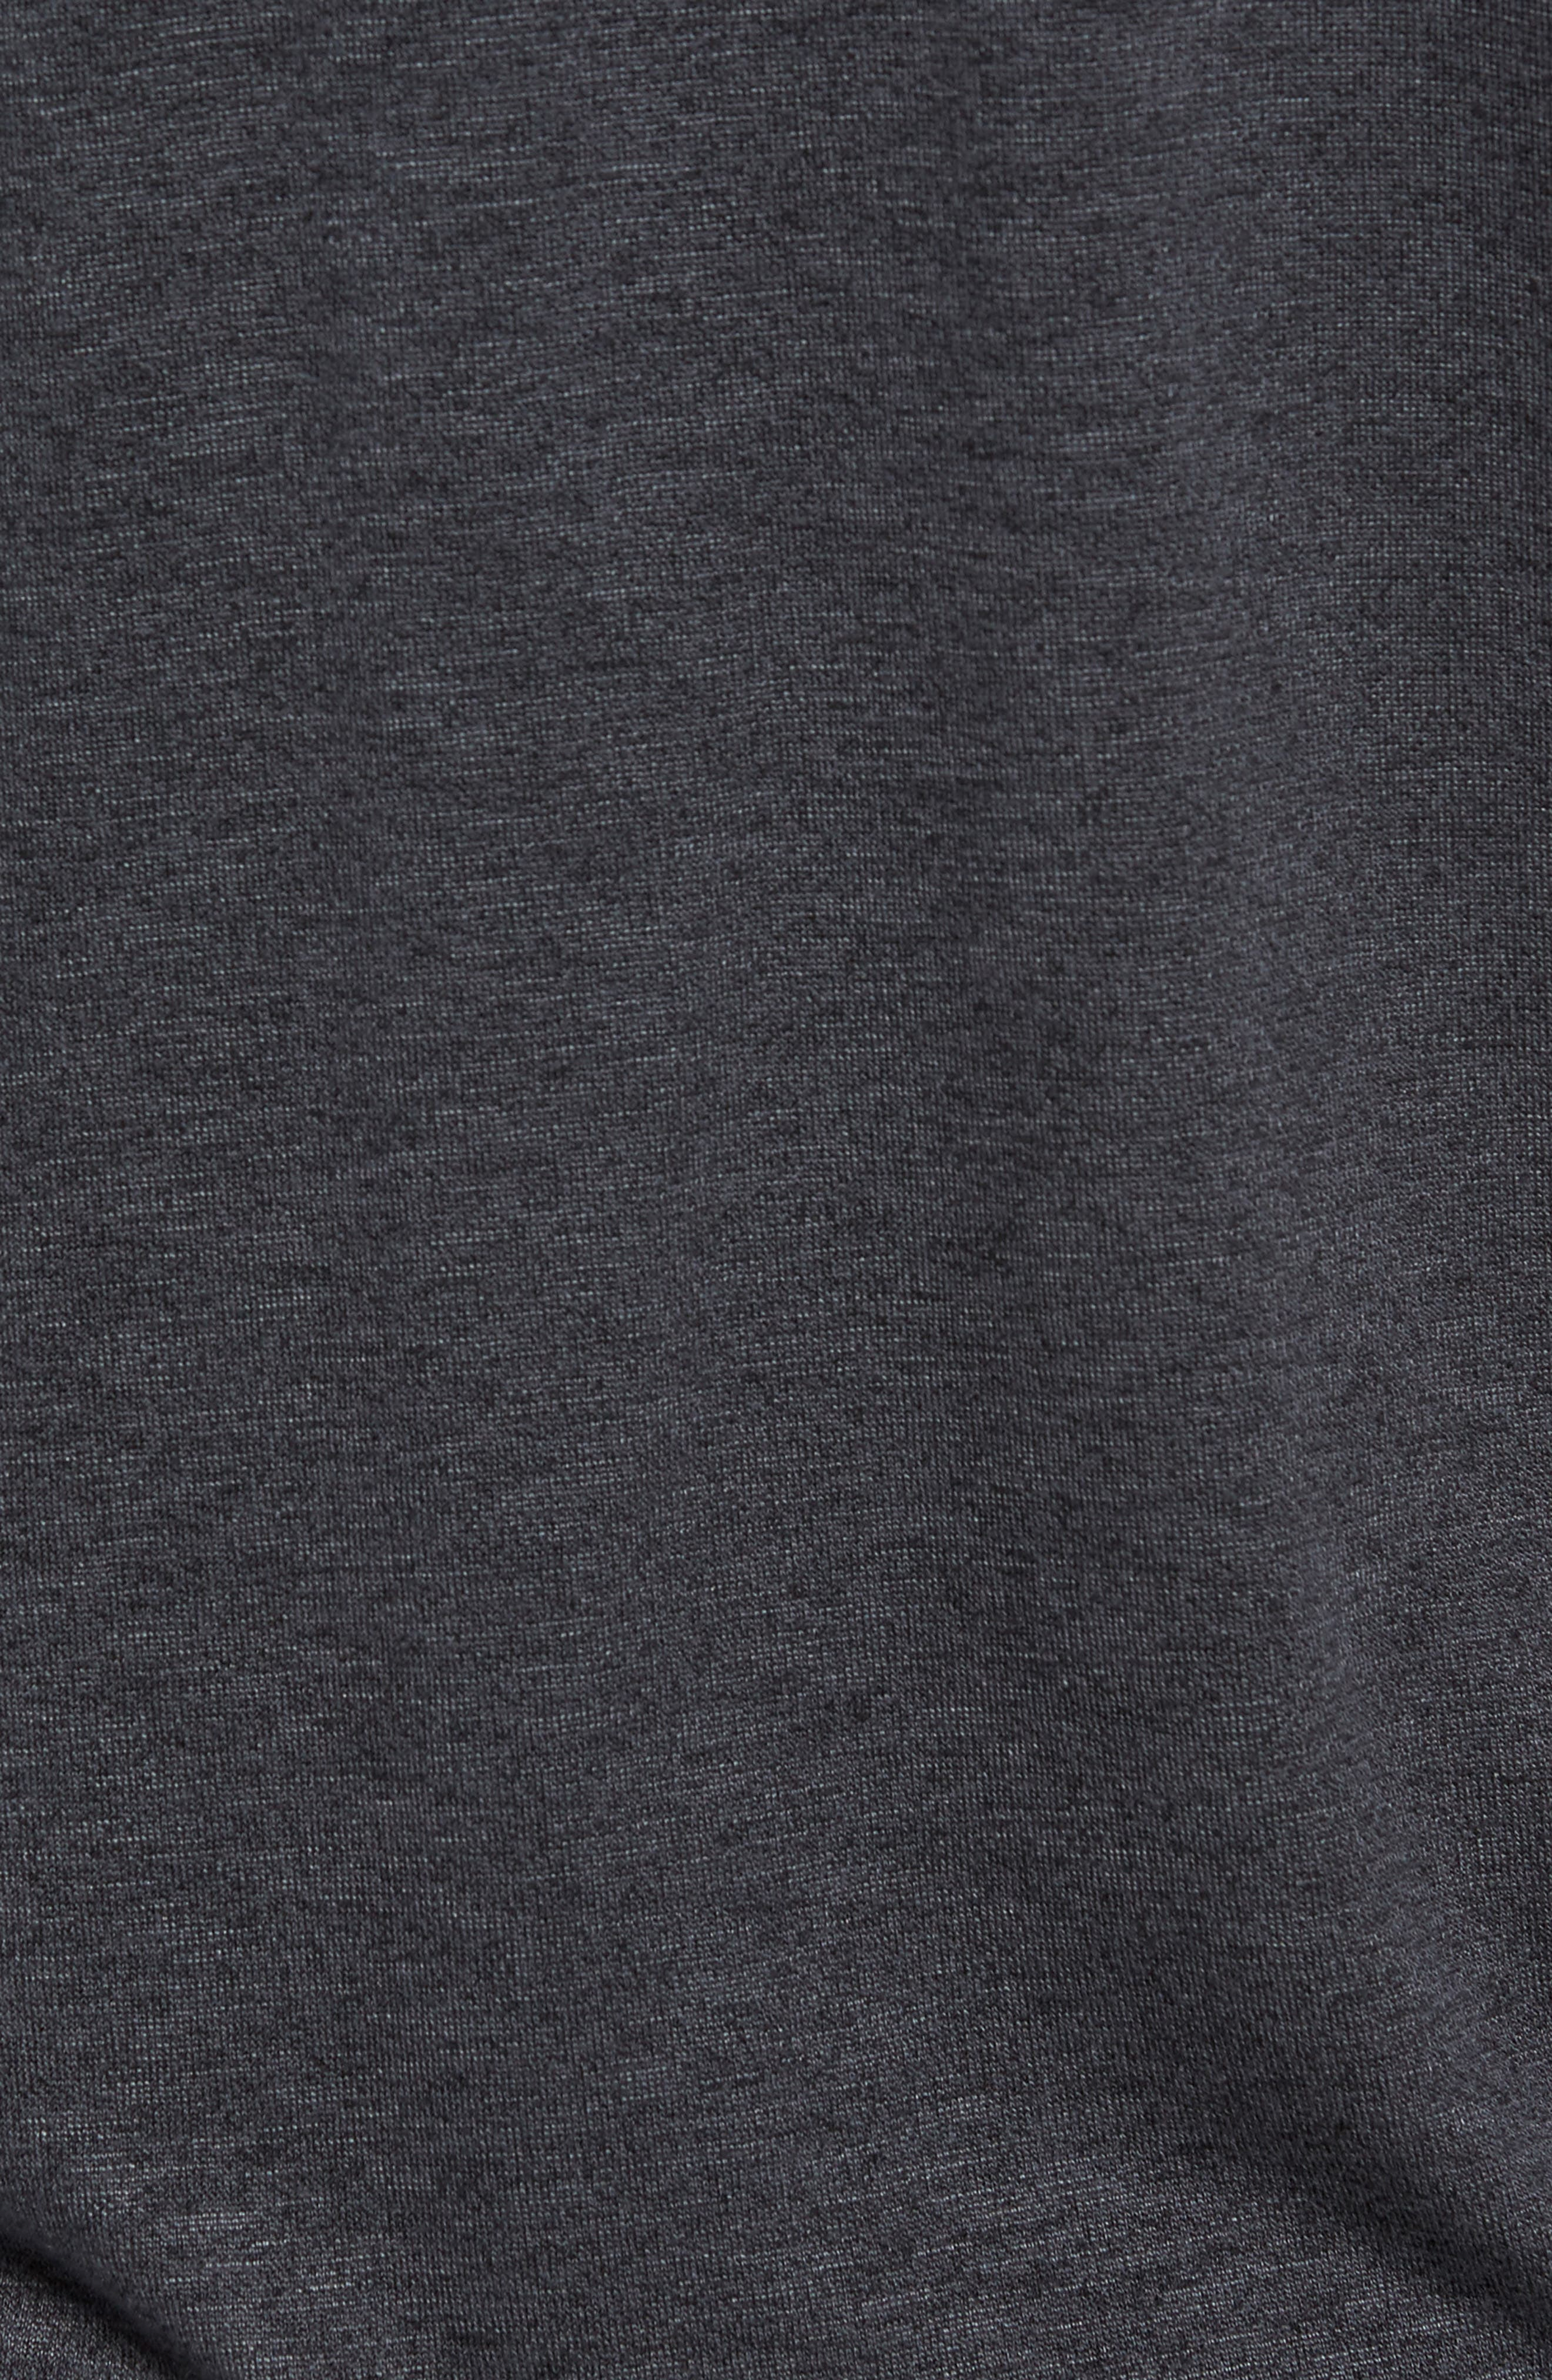 Long Sleeve T-Shirt,                             Alternate thumbnail 30, color,